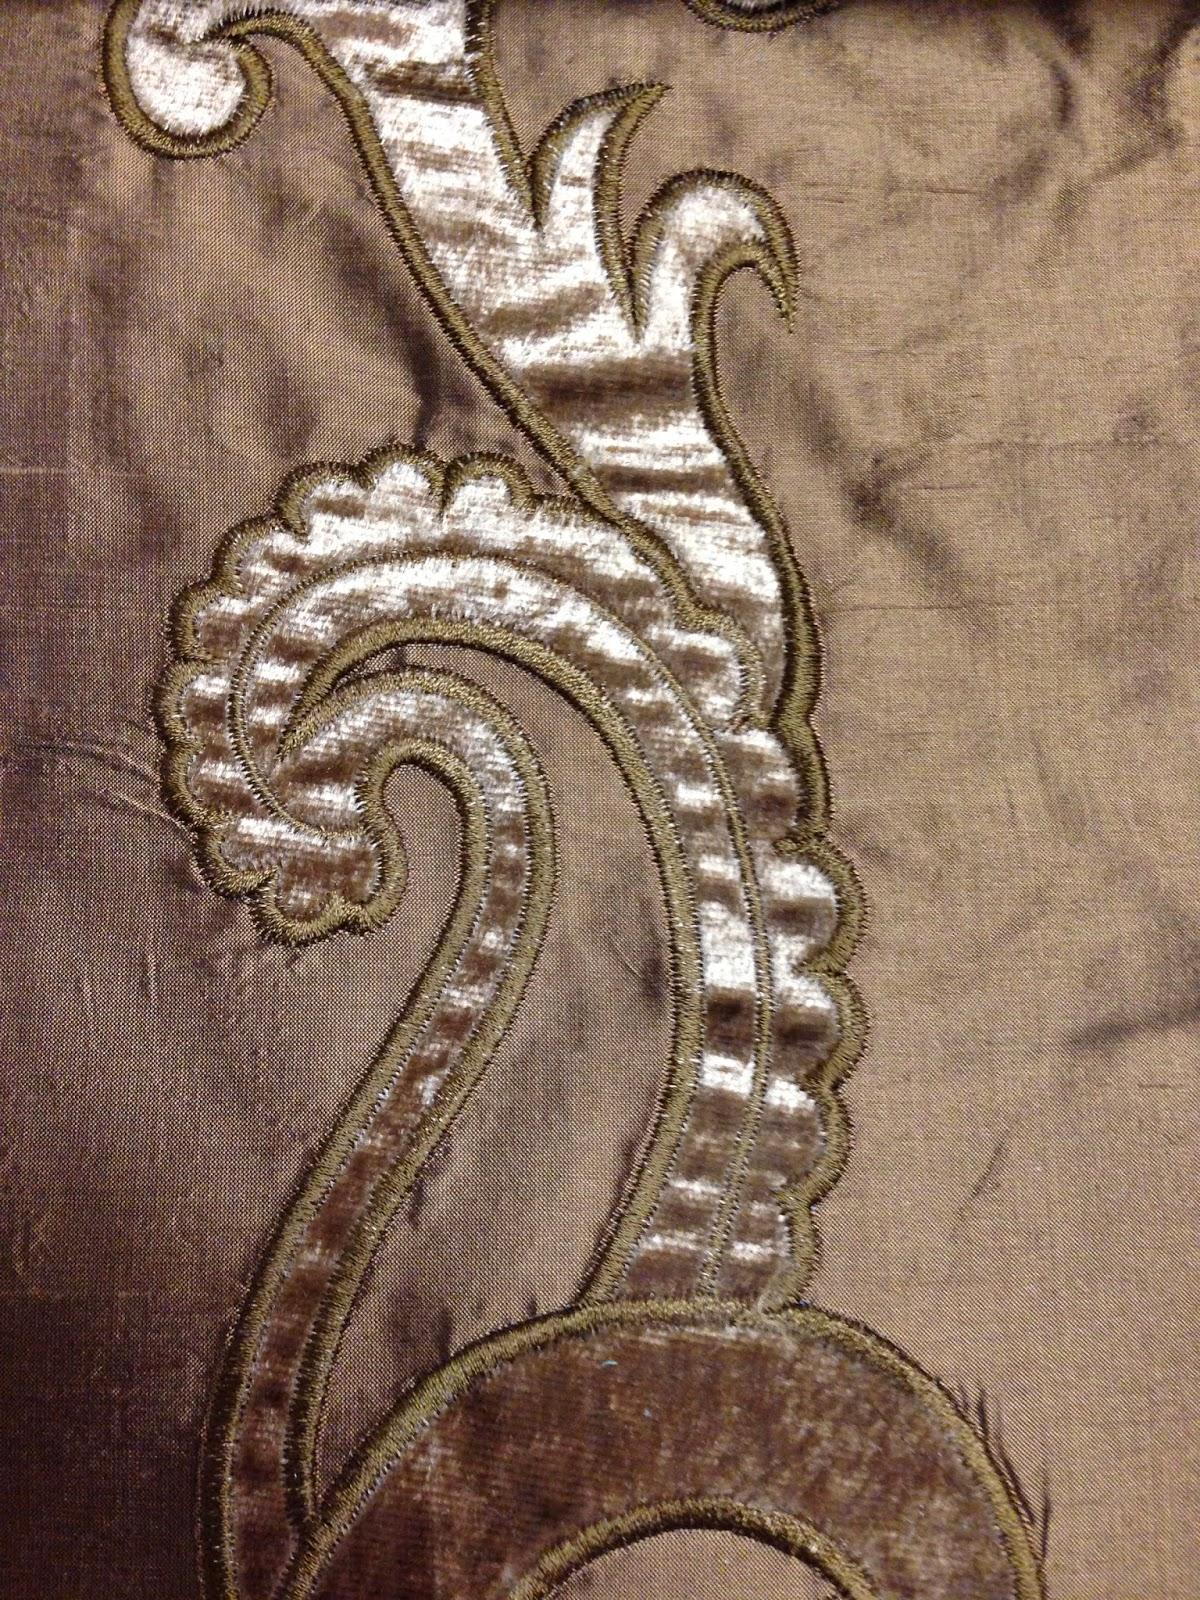 prints, woven, Mandaley